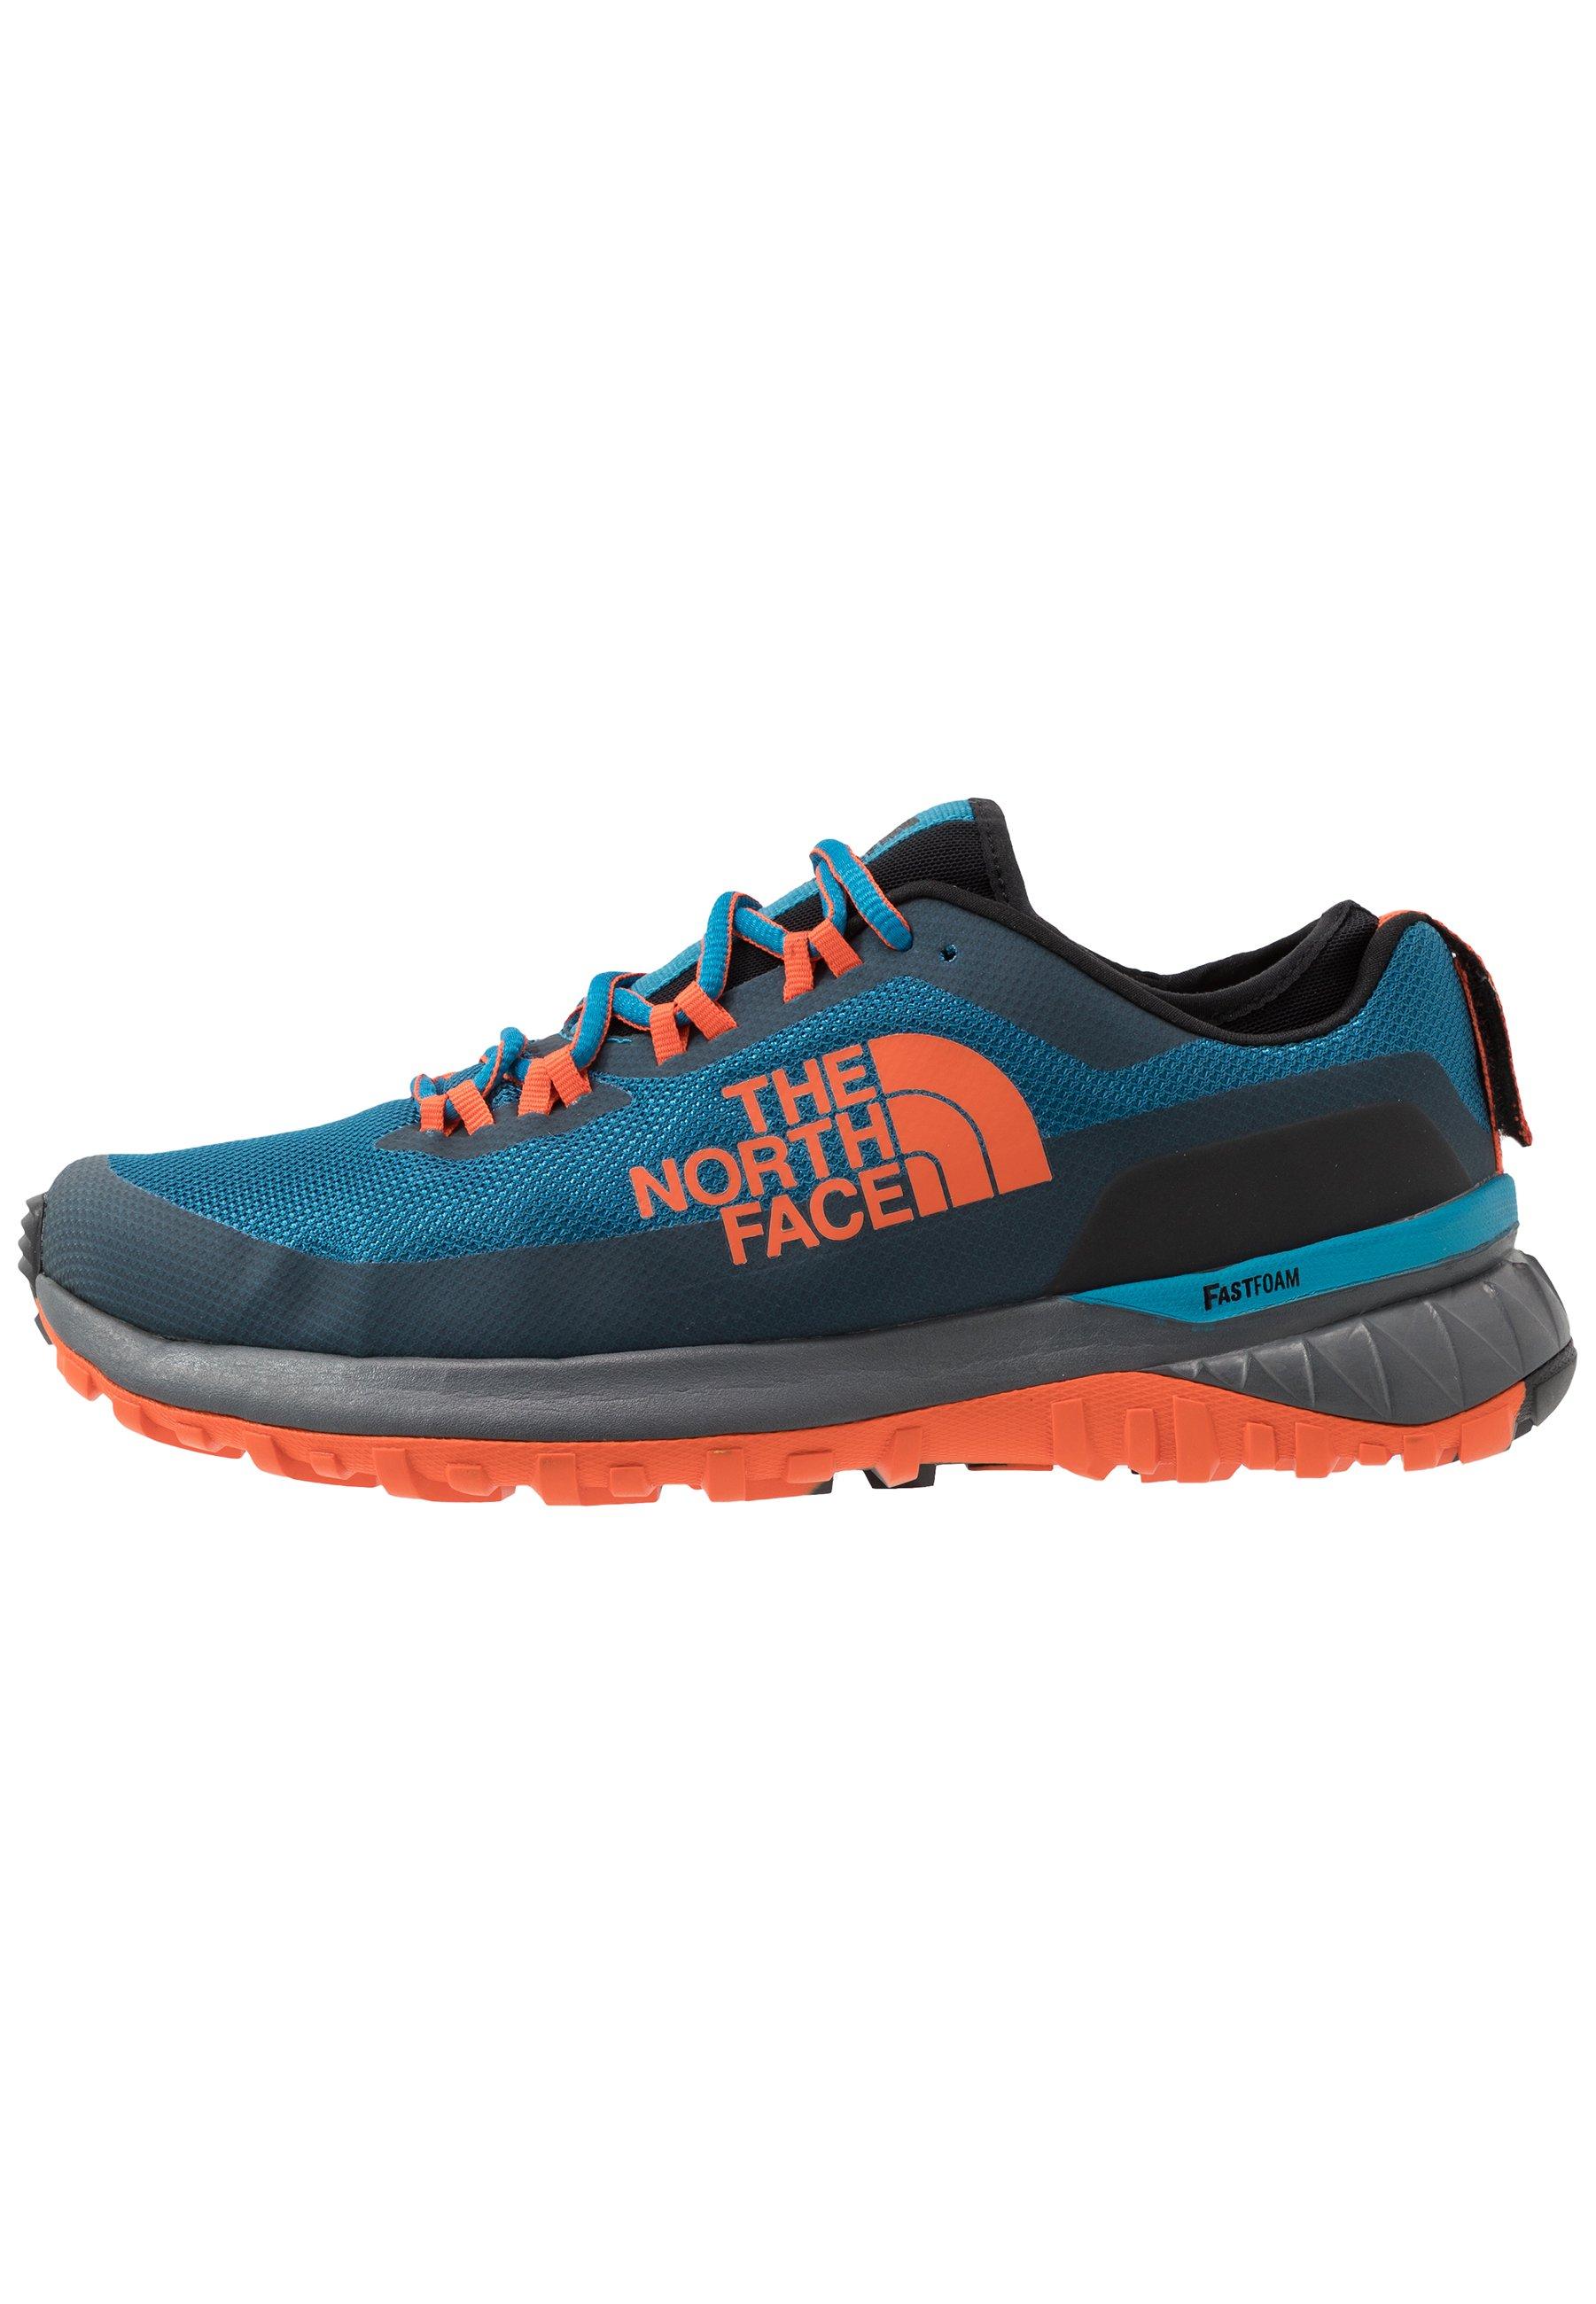 MEN'S ULTRA TRACTION Hikingskor baja bluezinc grey